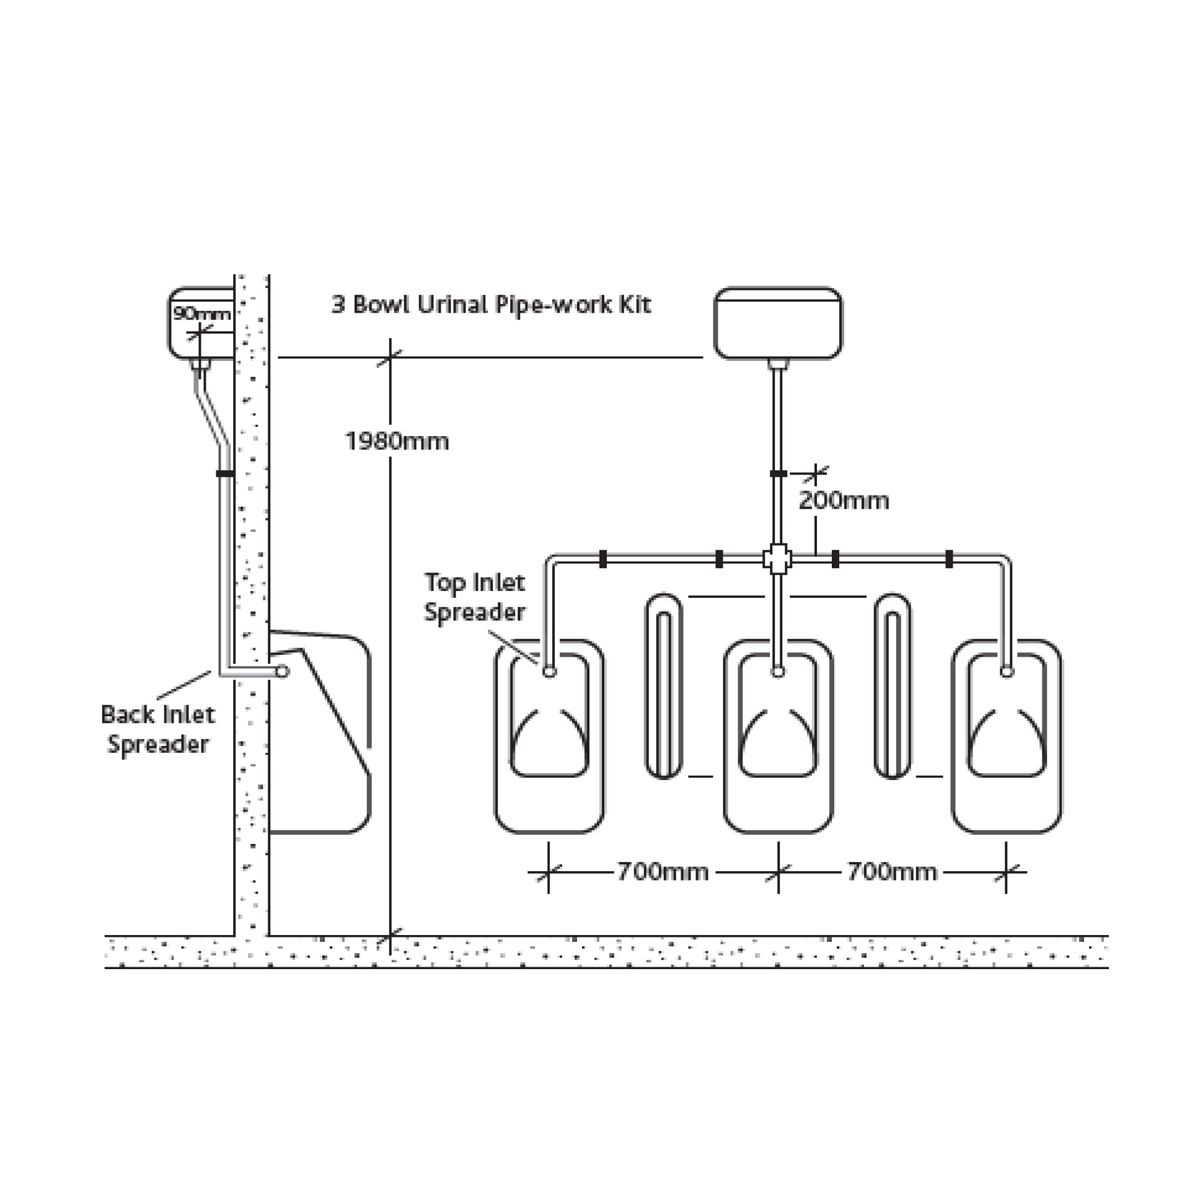 RAK Exposed Automatic Urinal Cistern 13.5L Measurements